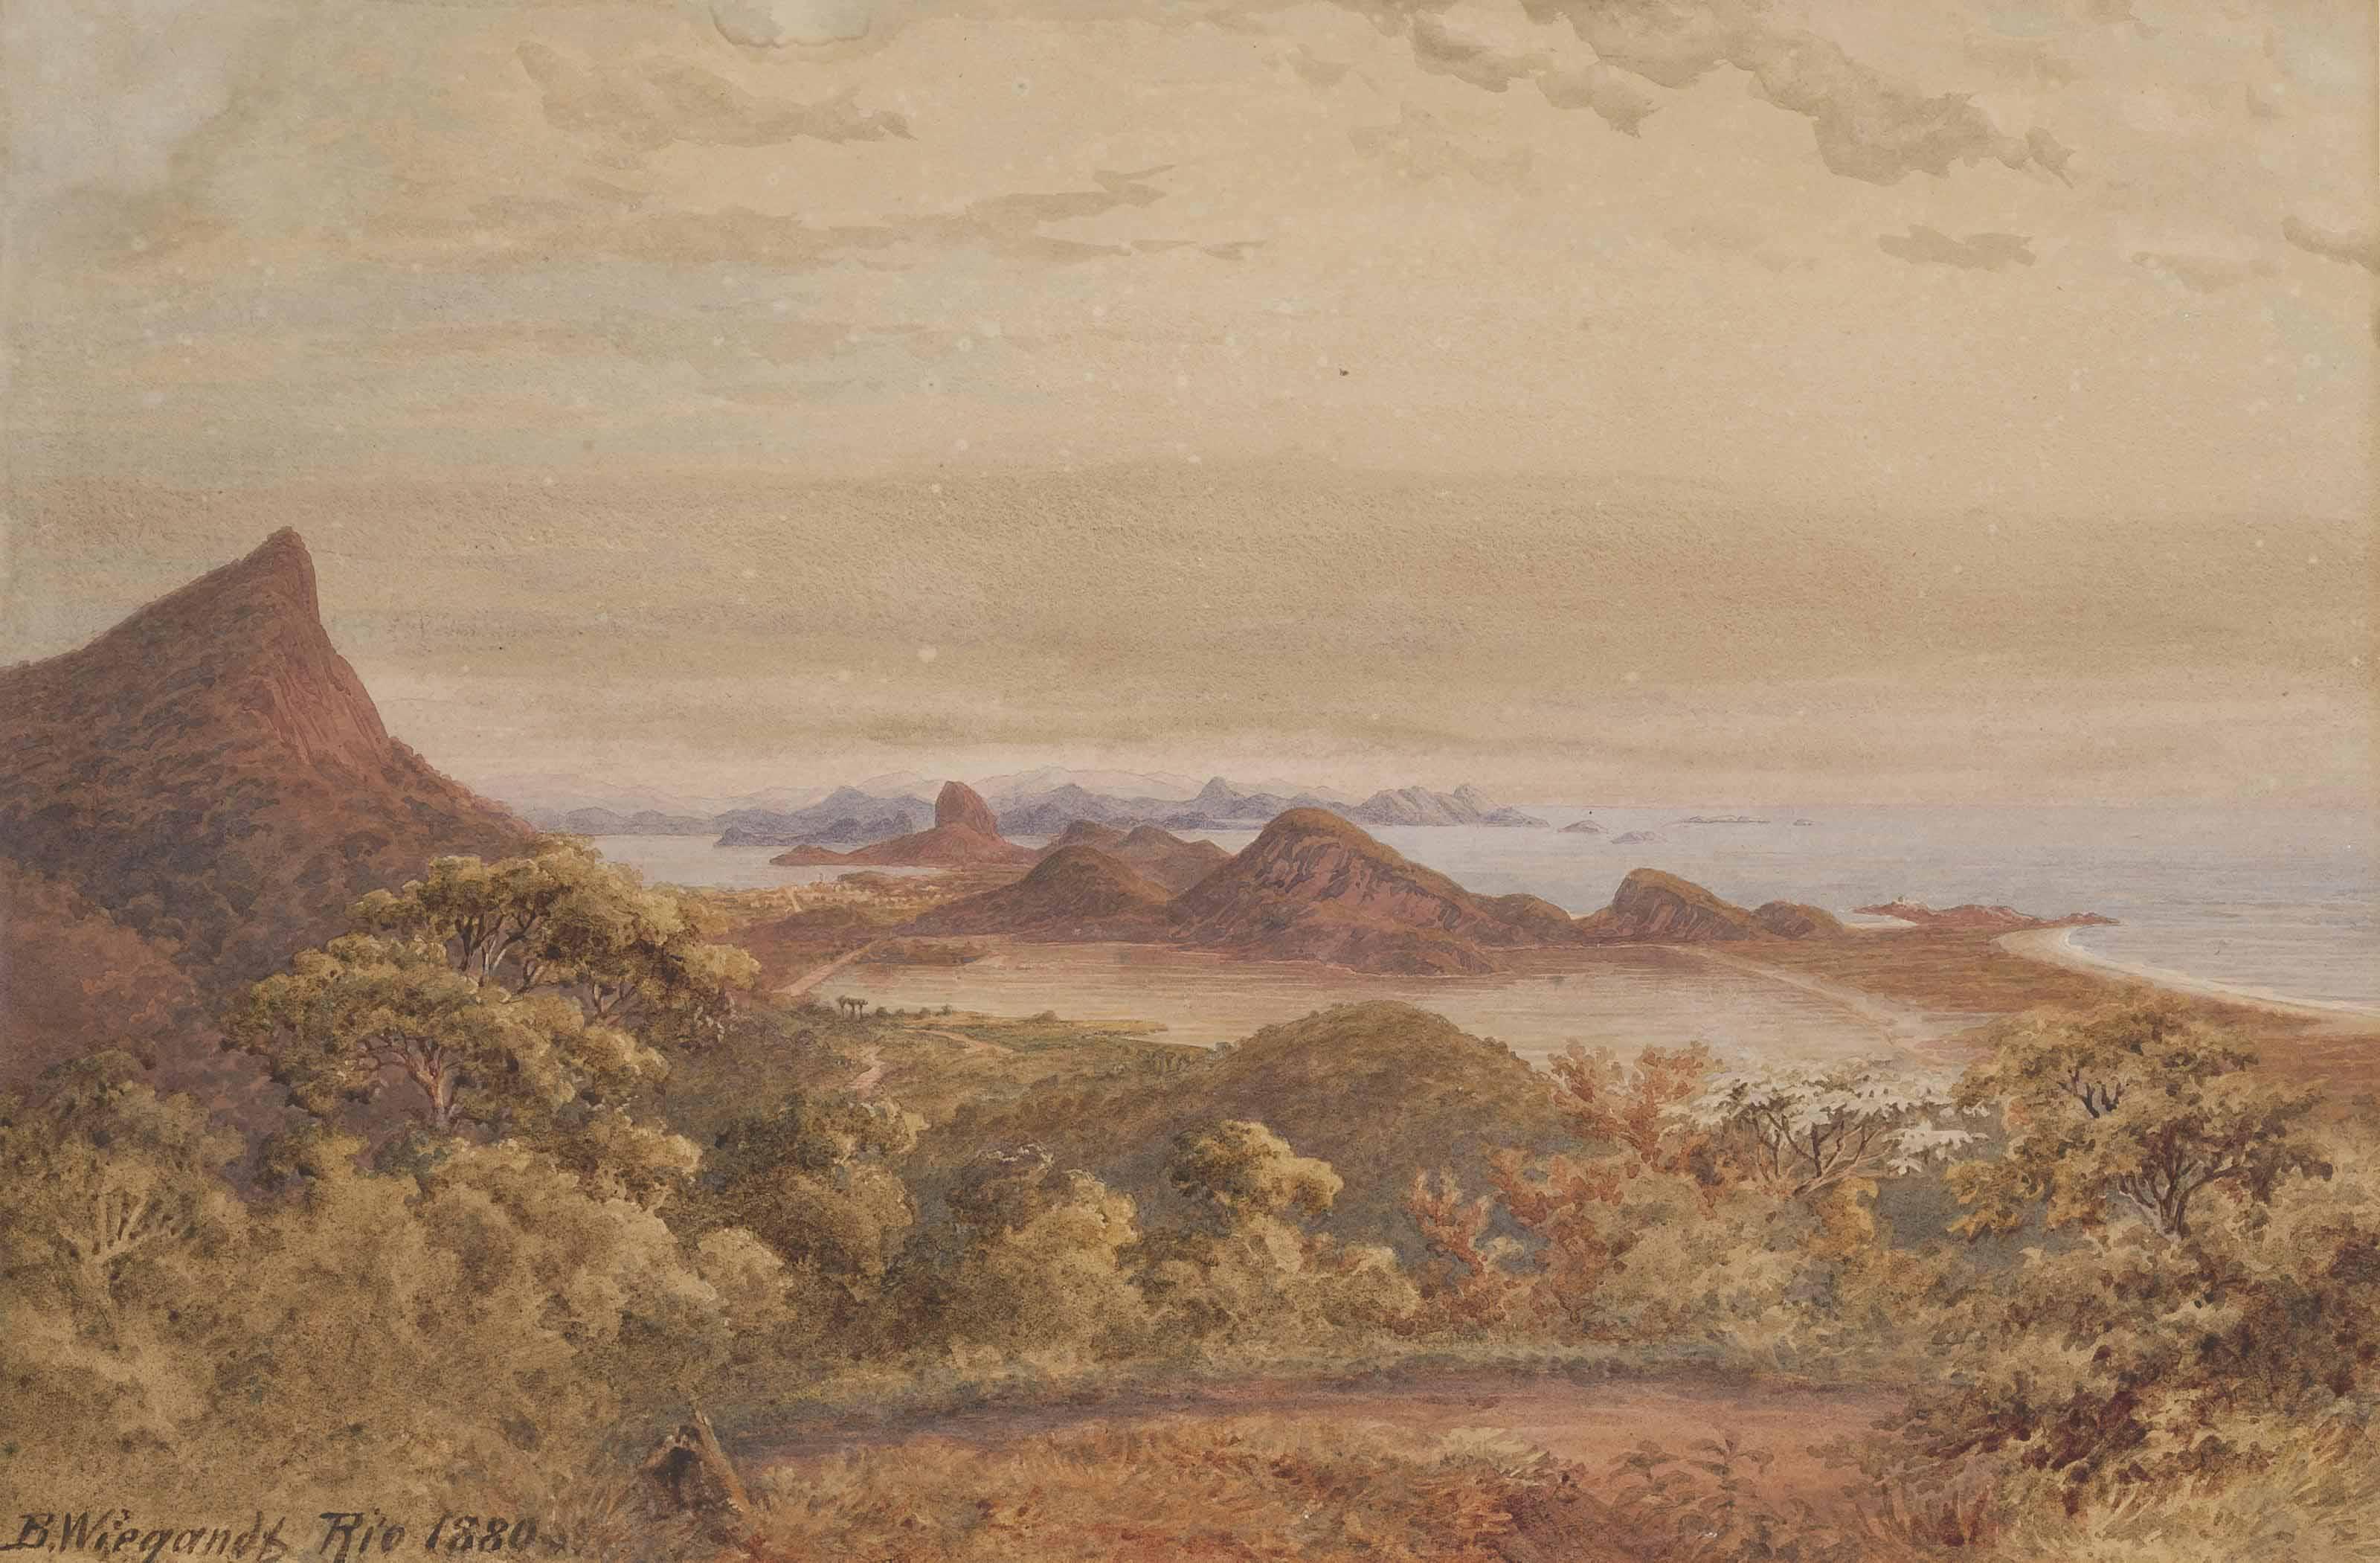 A view of Rio de Janiero, taken from the west